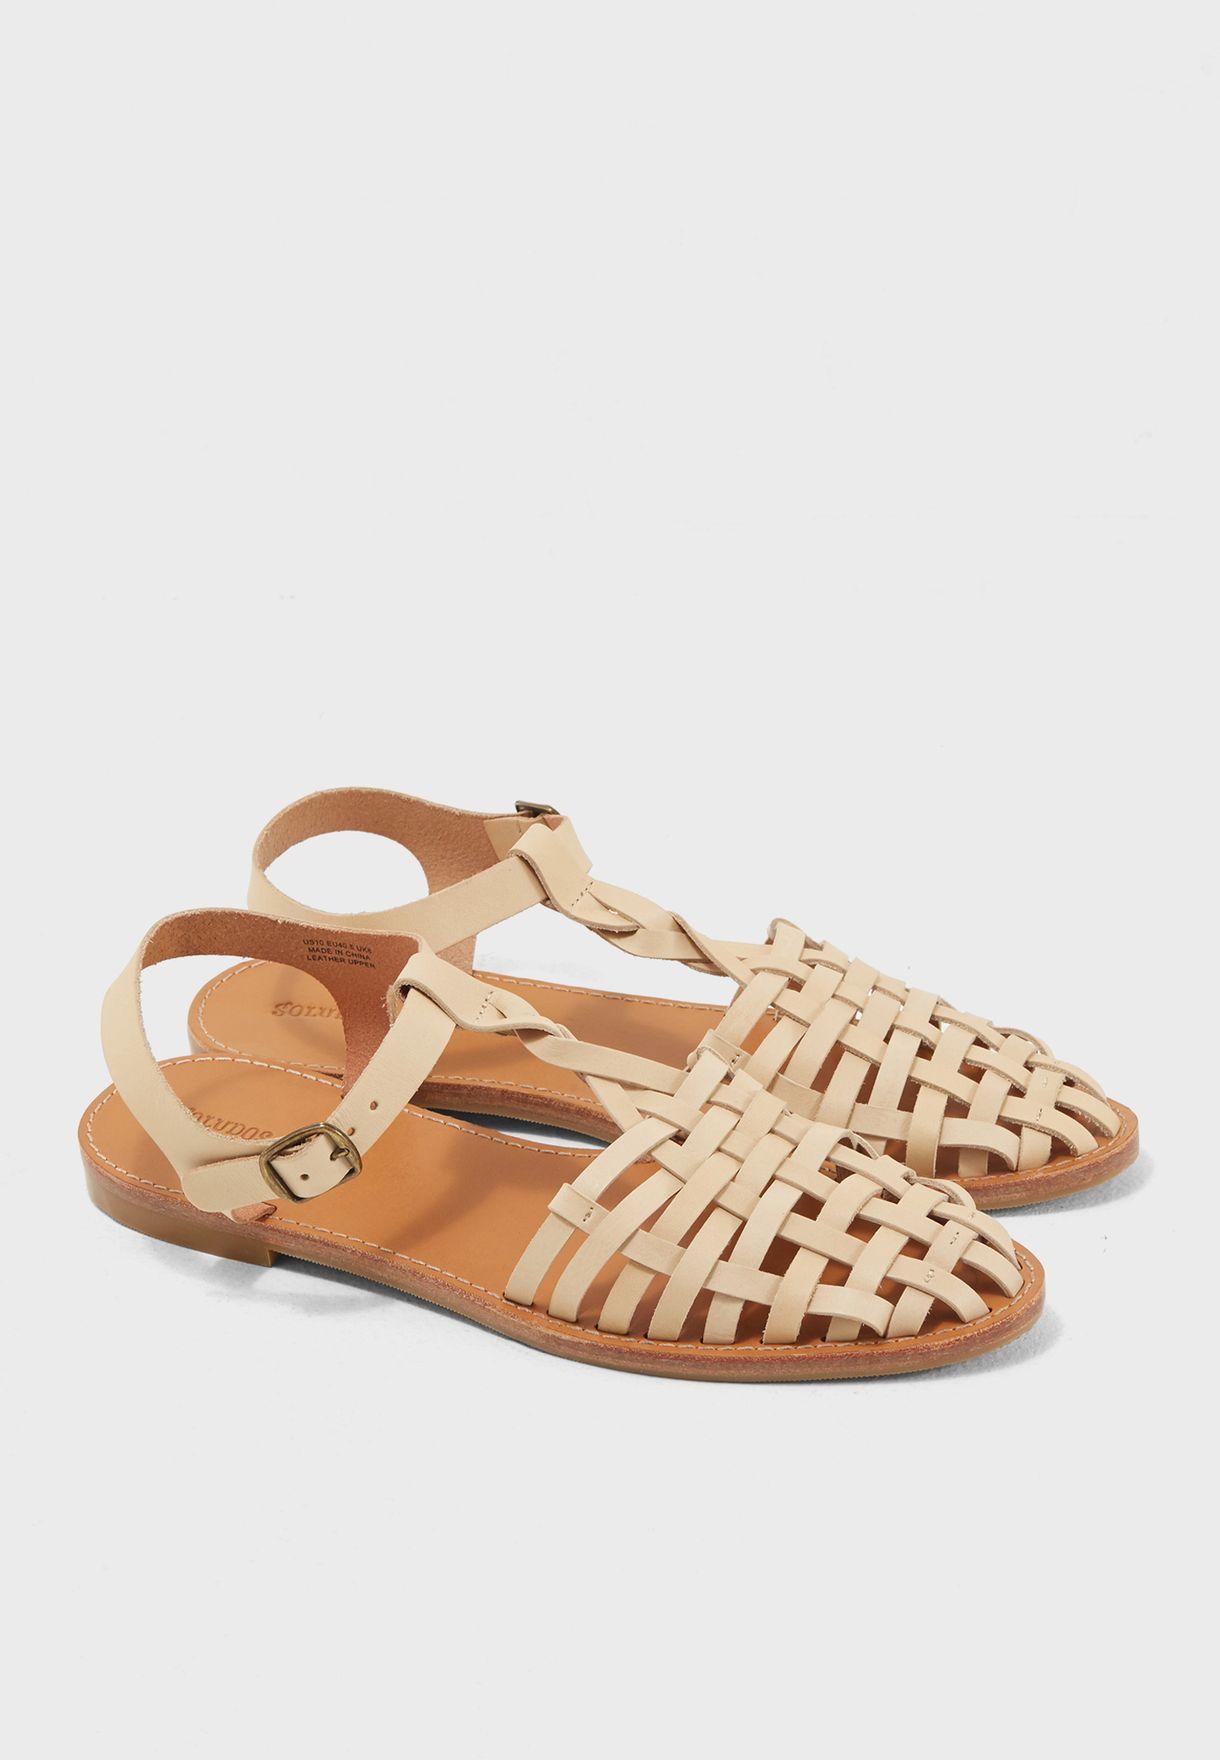 3472960e9 Shop Soludos beige Woven Fisherman Sandal 1000302 for Women in UAE ...